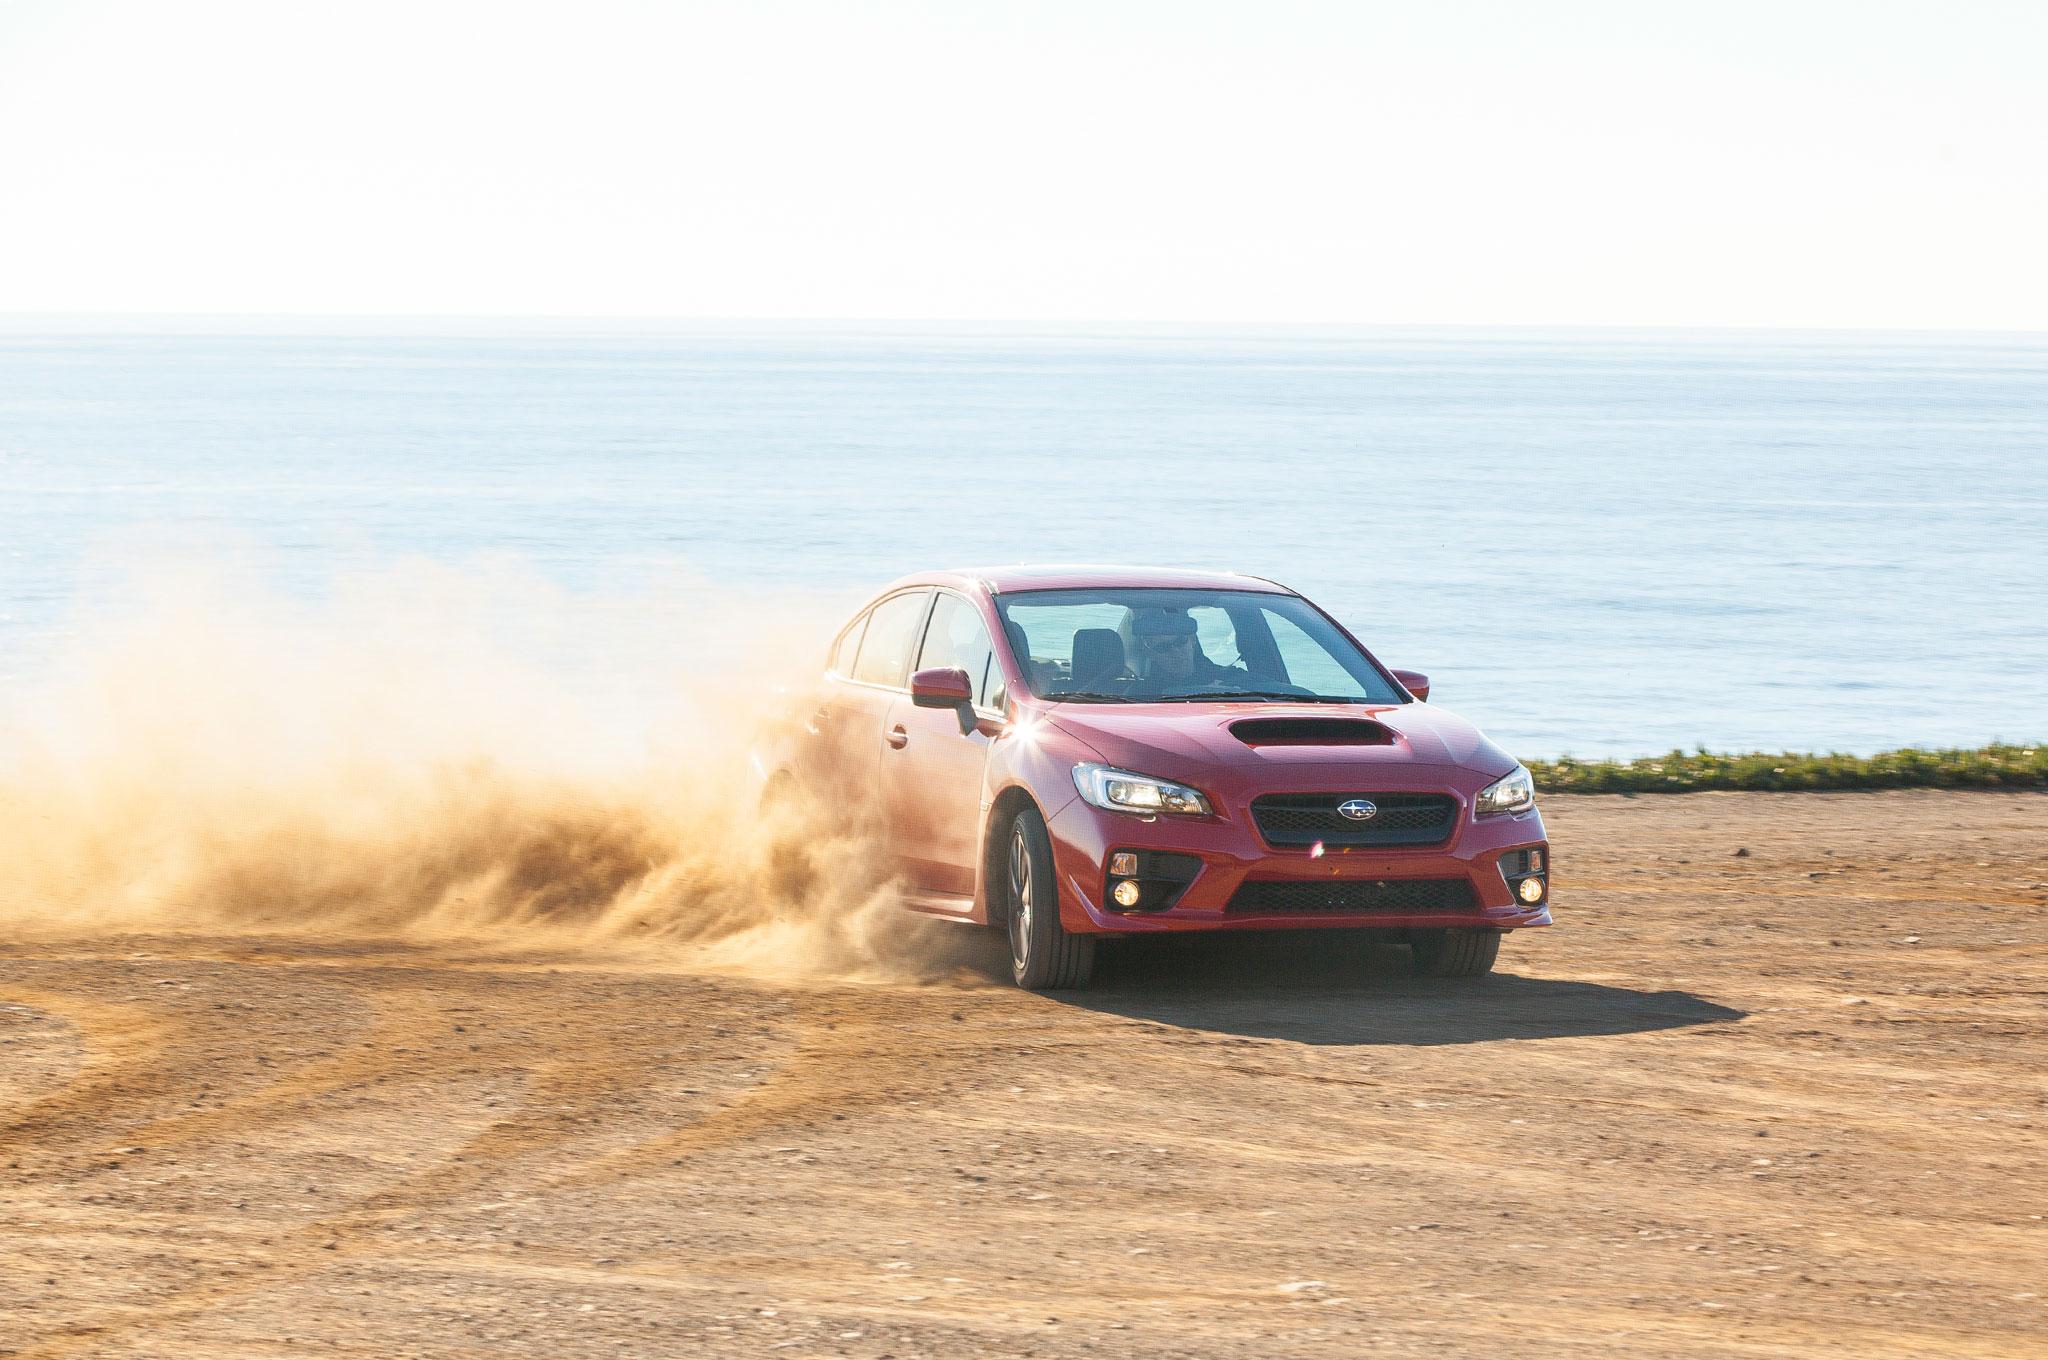 2015 Subaru WRX Front Right View 61